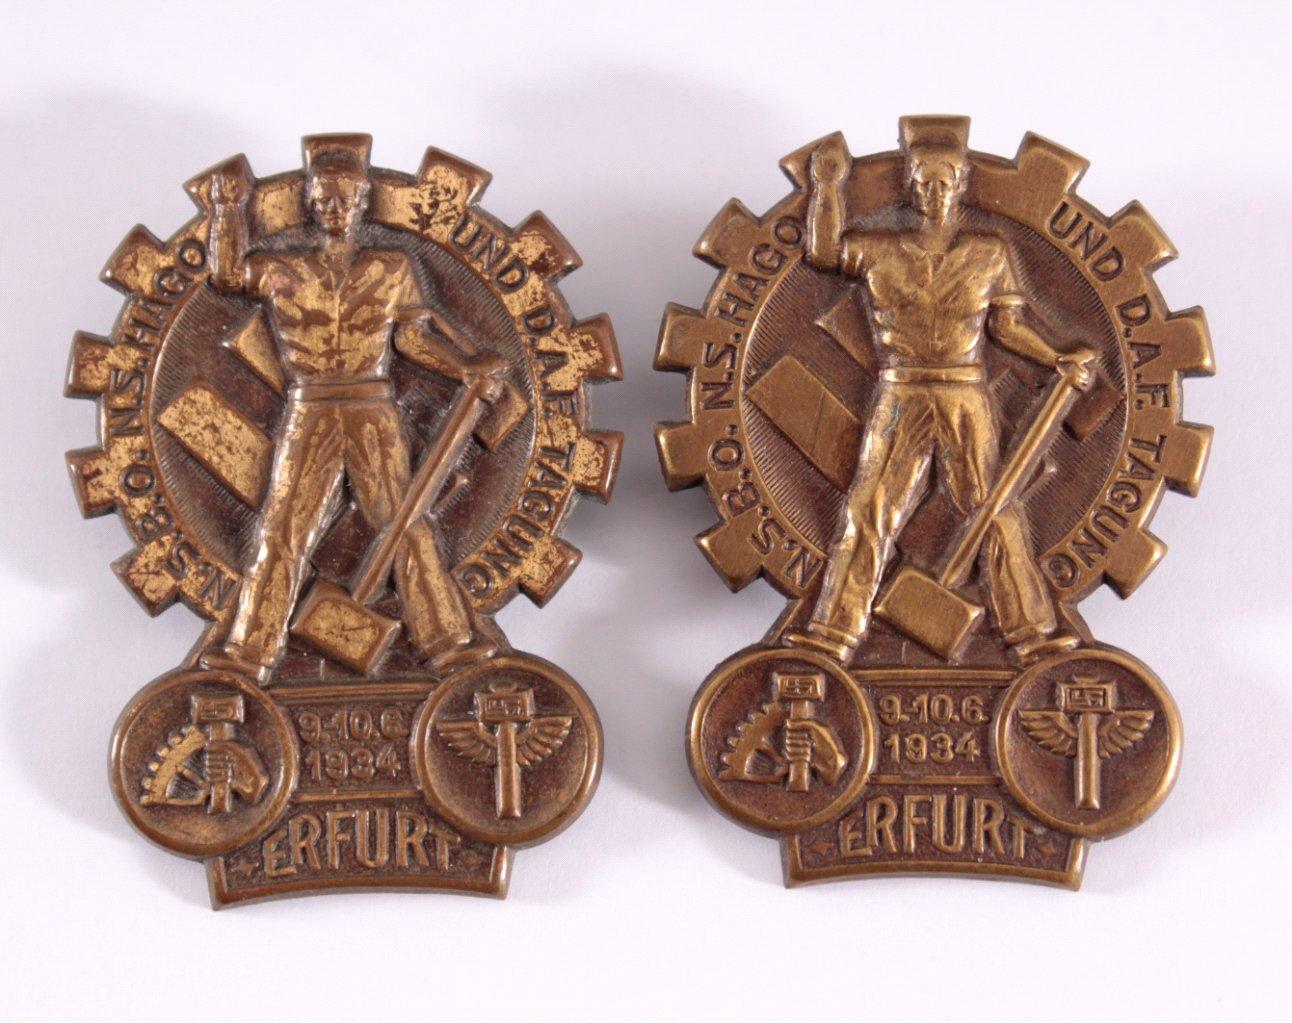 2 Abzeichen N.S.B.O., N.S.Hago und D.A.F. Tagung Erfurt 1934